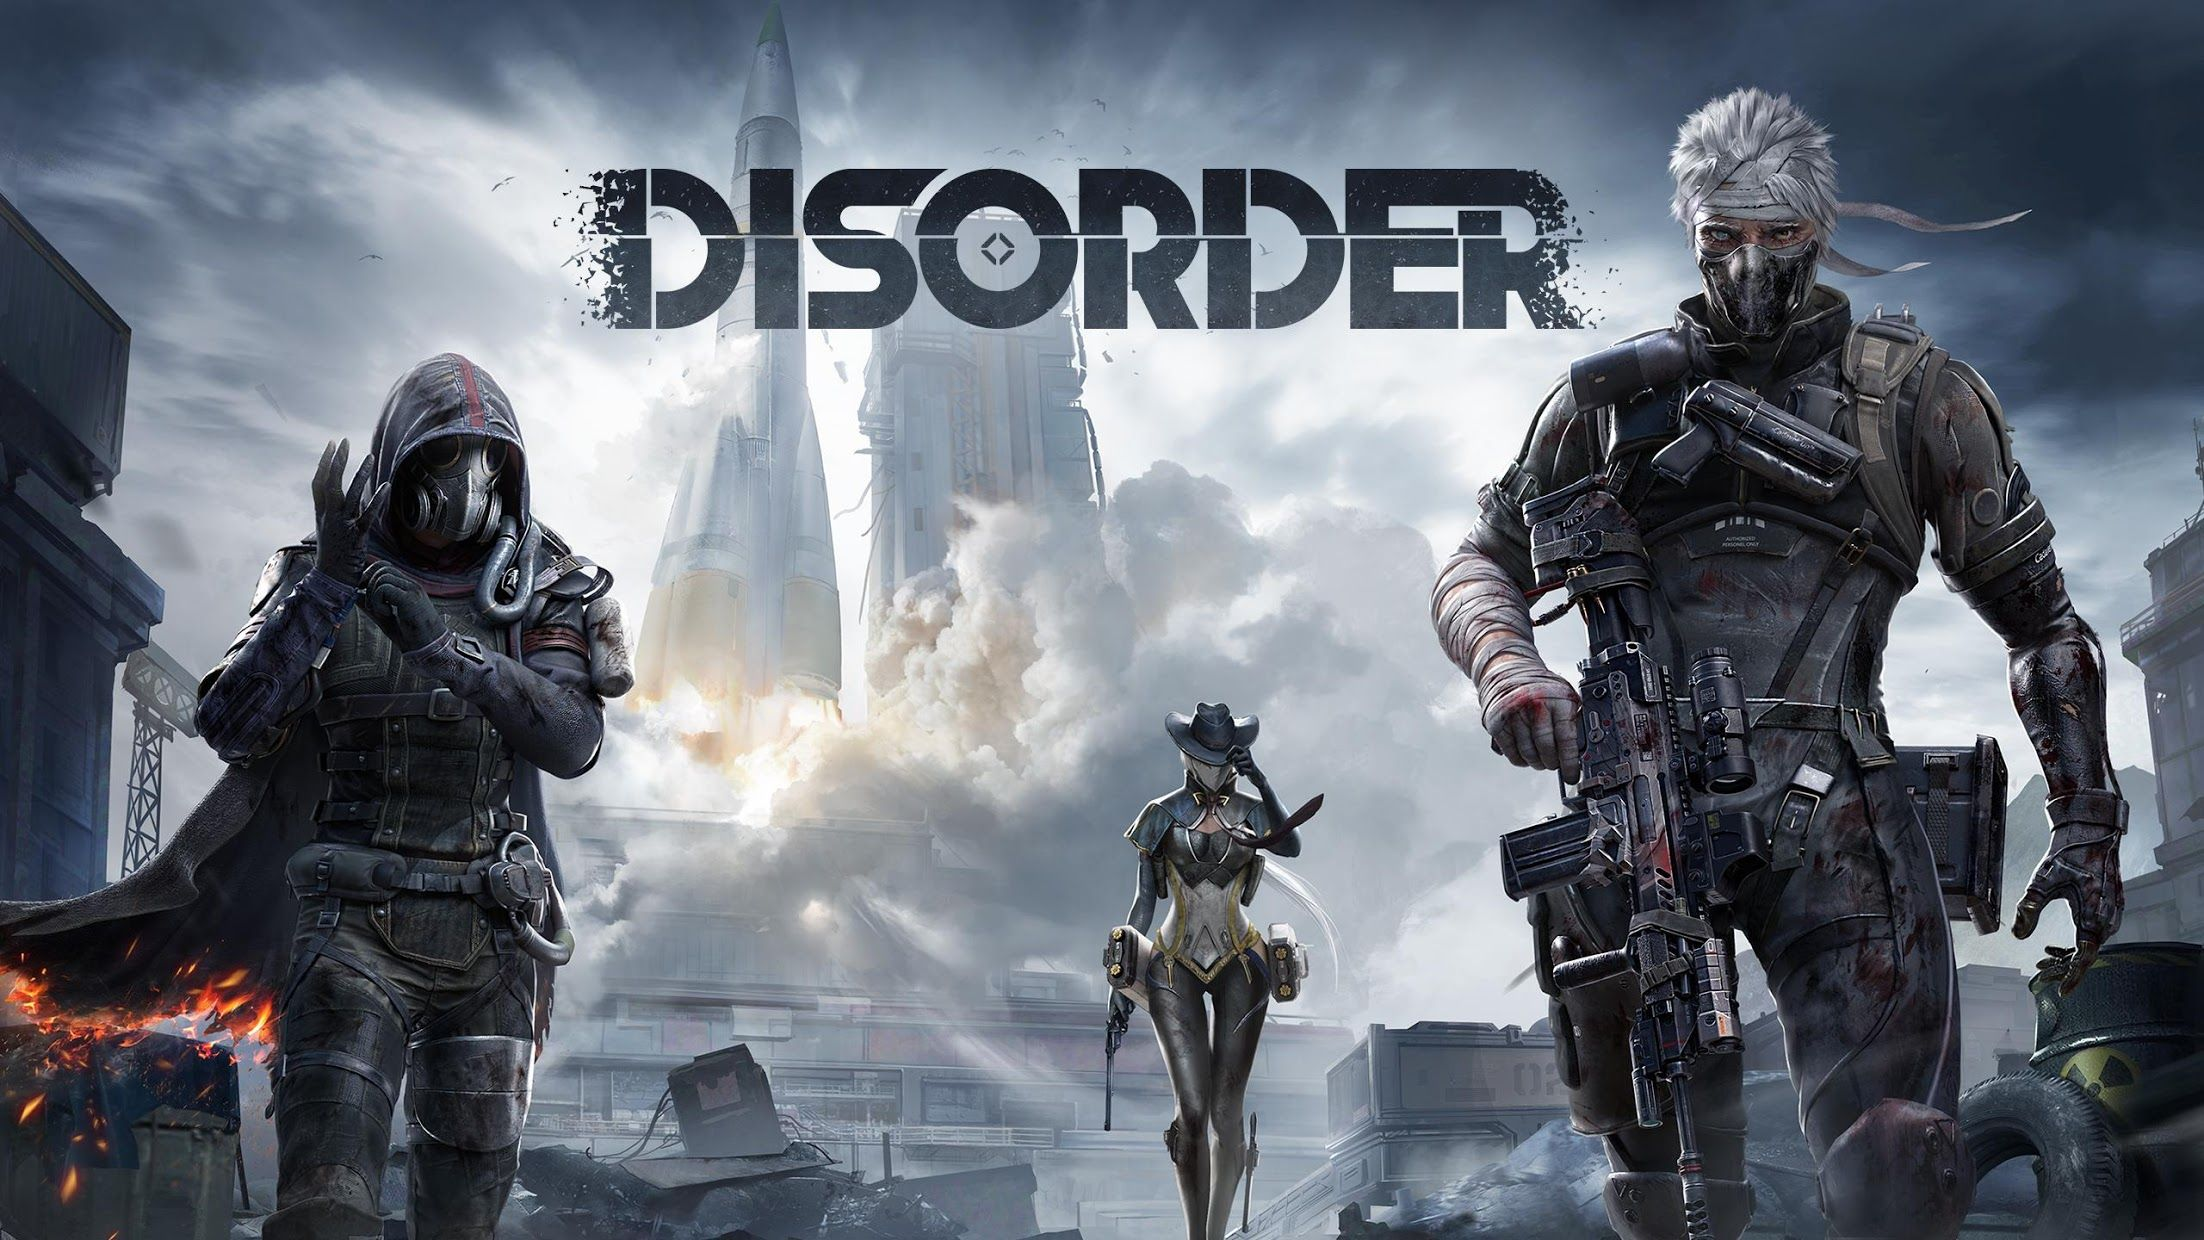 Disorder 游戏截图1